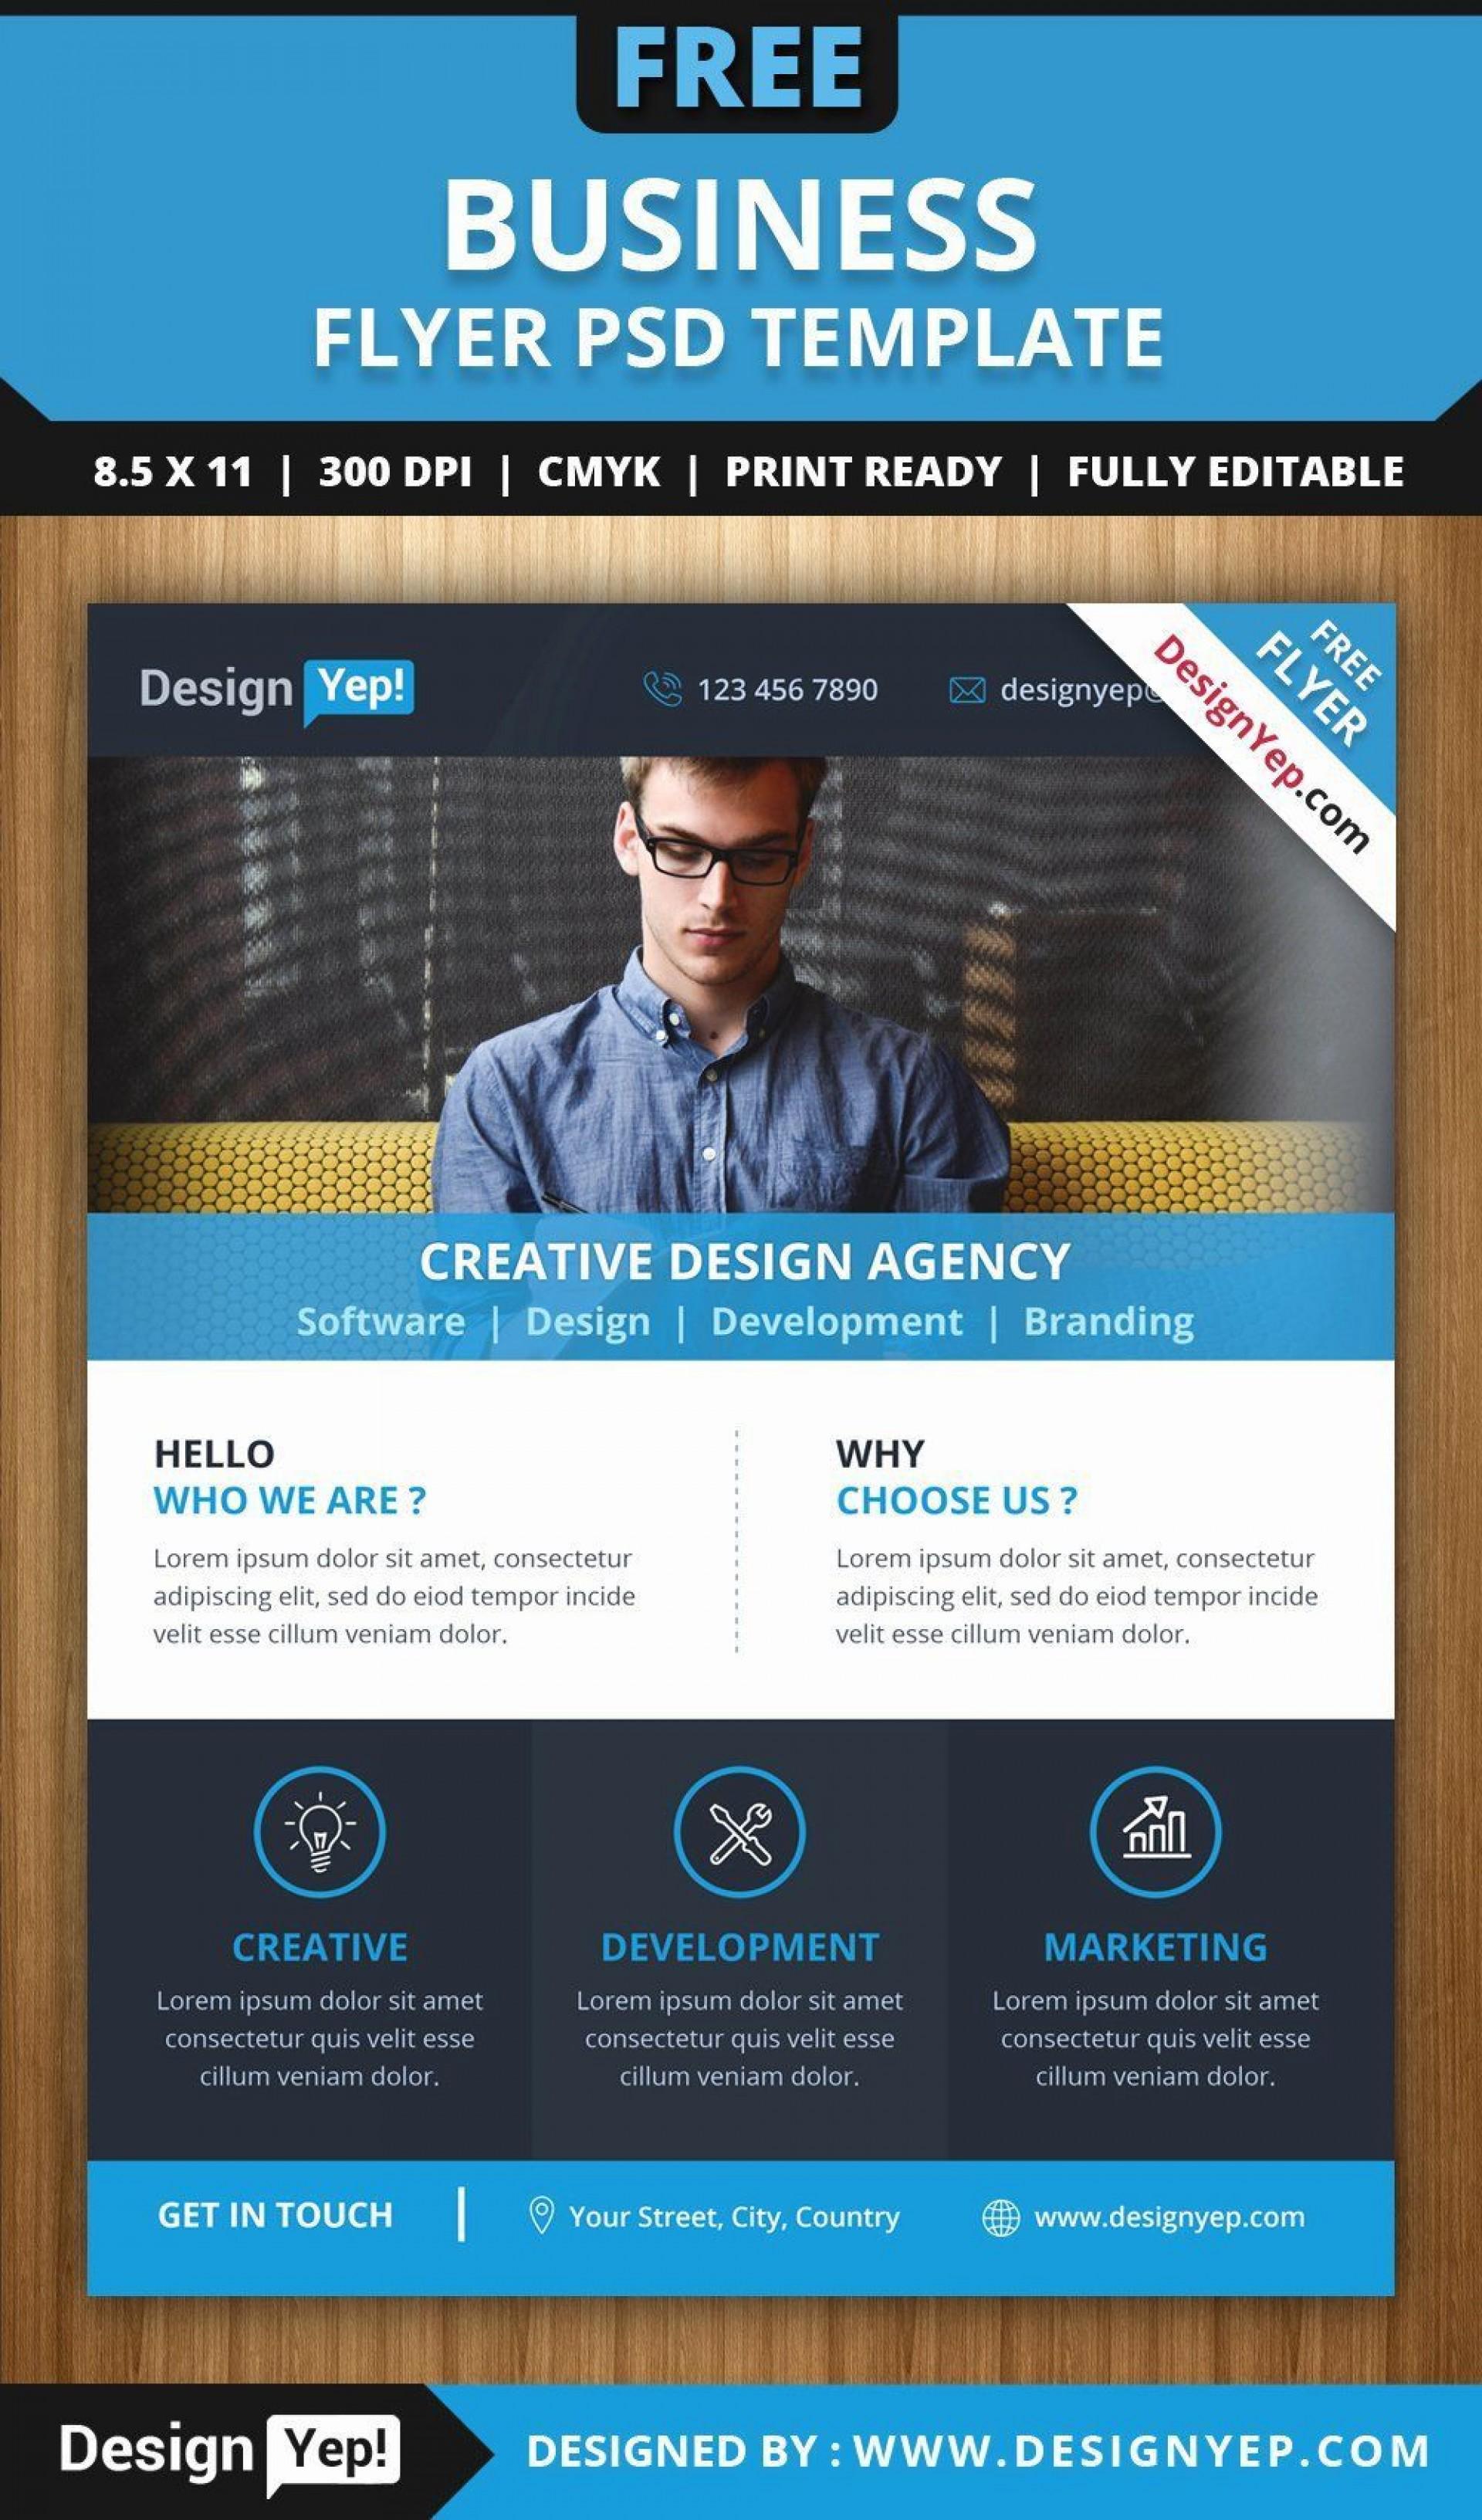 001 Singular Busines Flyer Template Free Download Concept  Psd Design1920